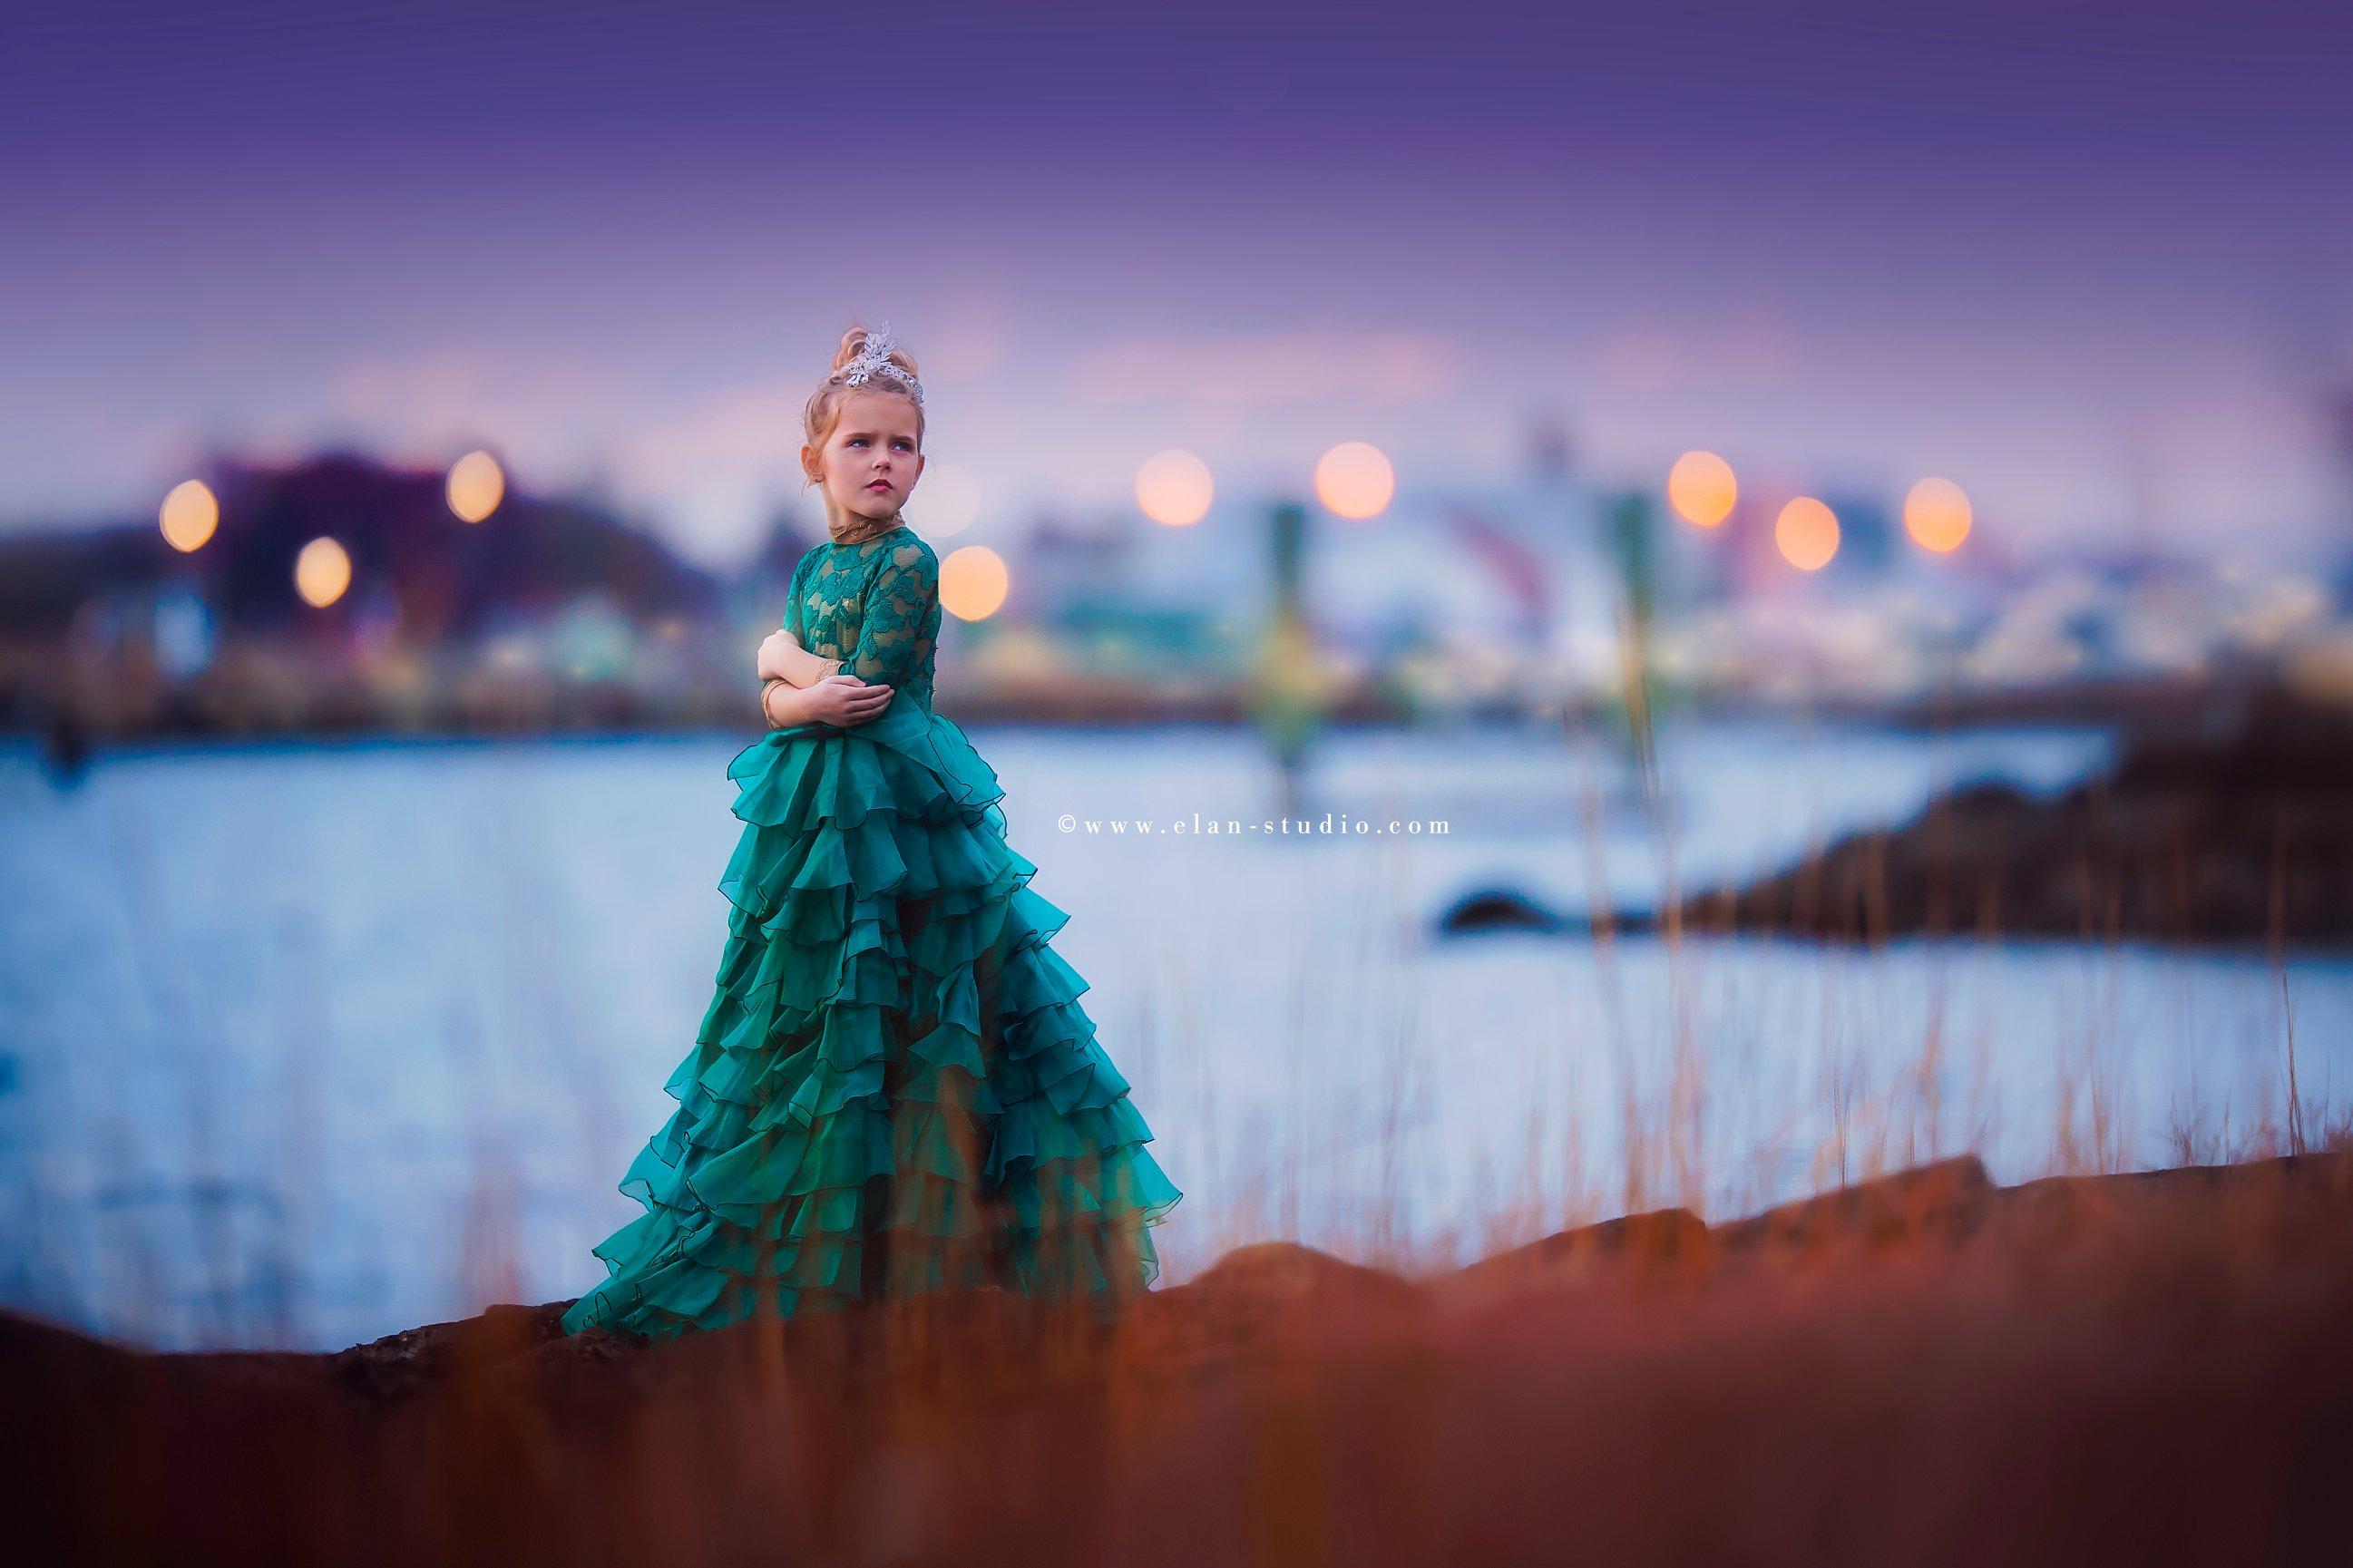 winter child portrait, Trish Scully dresses, formal children's portraiture, Elan Studio